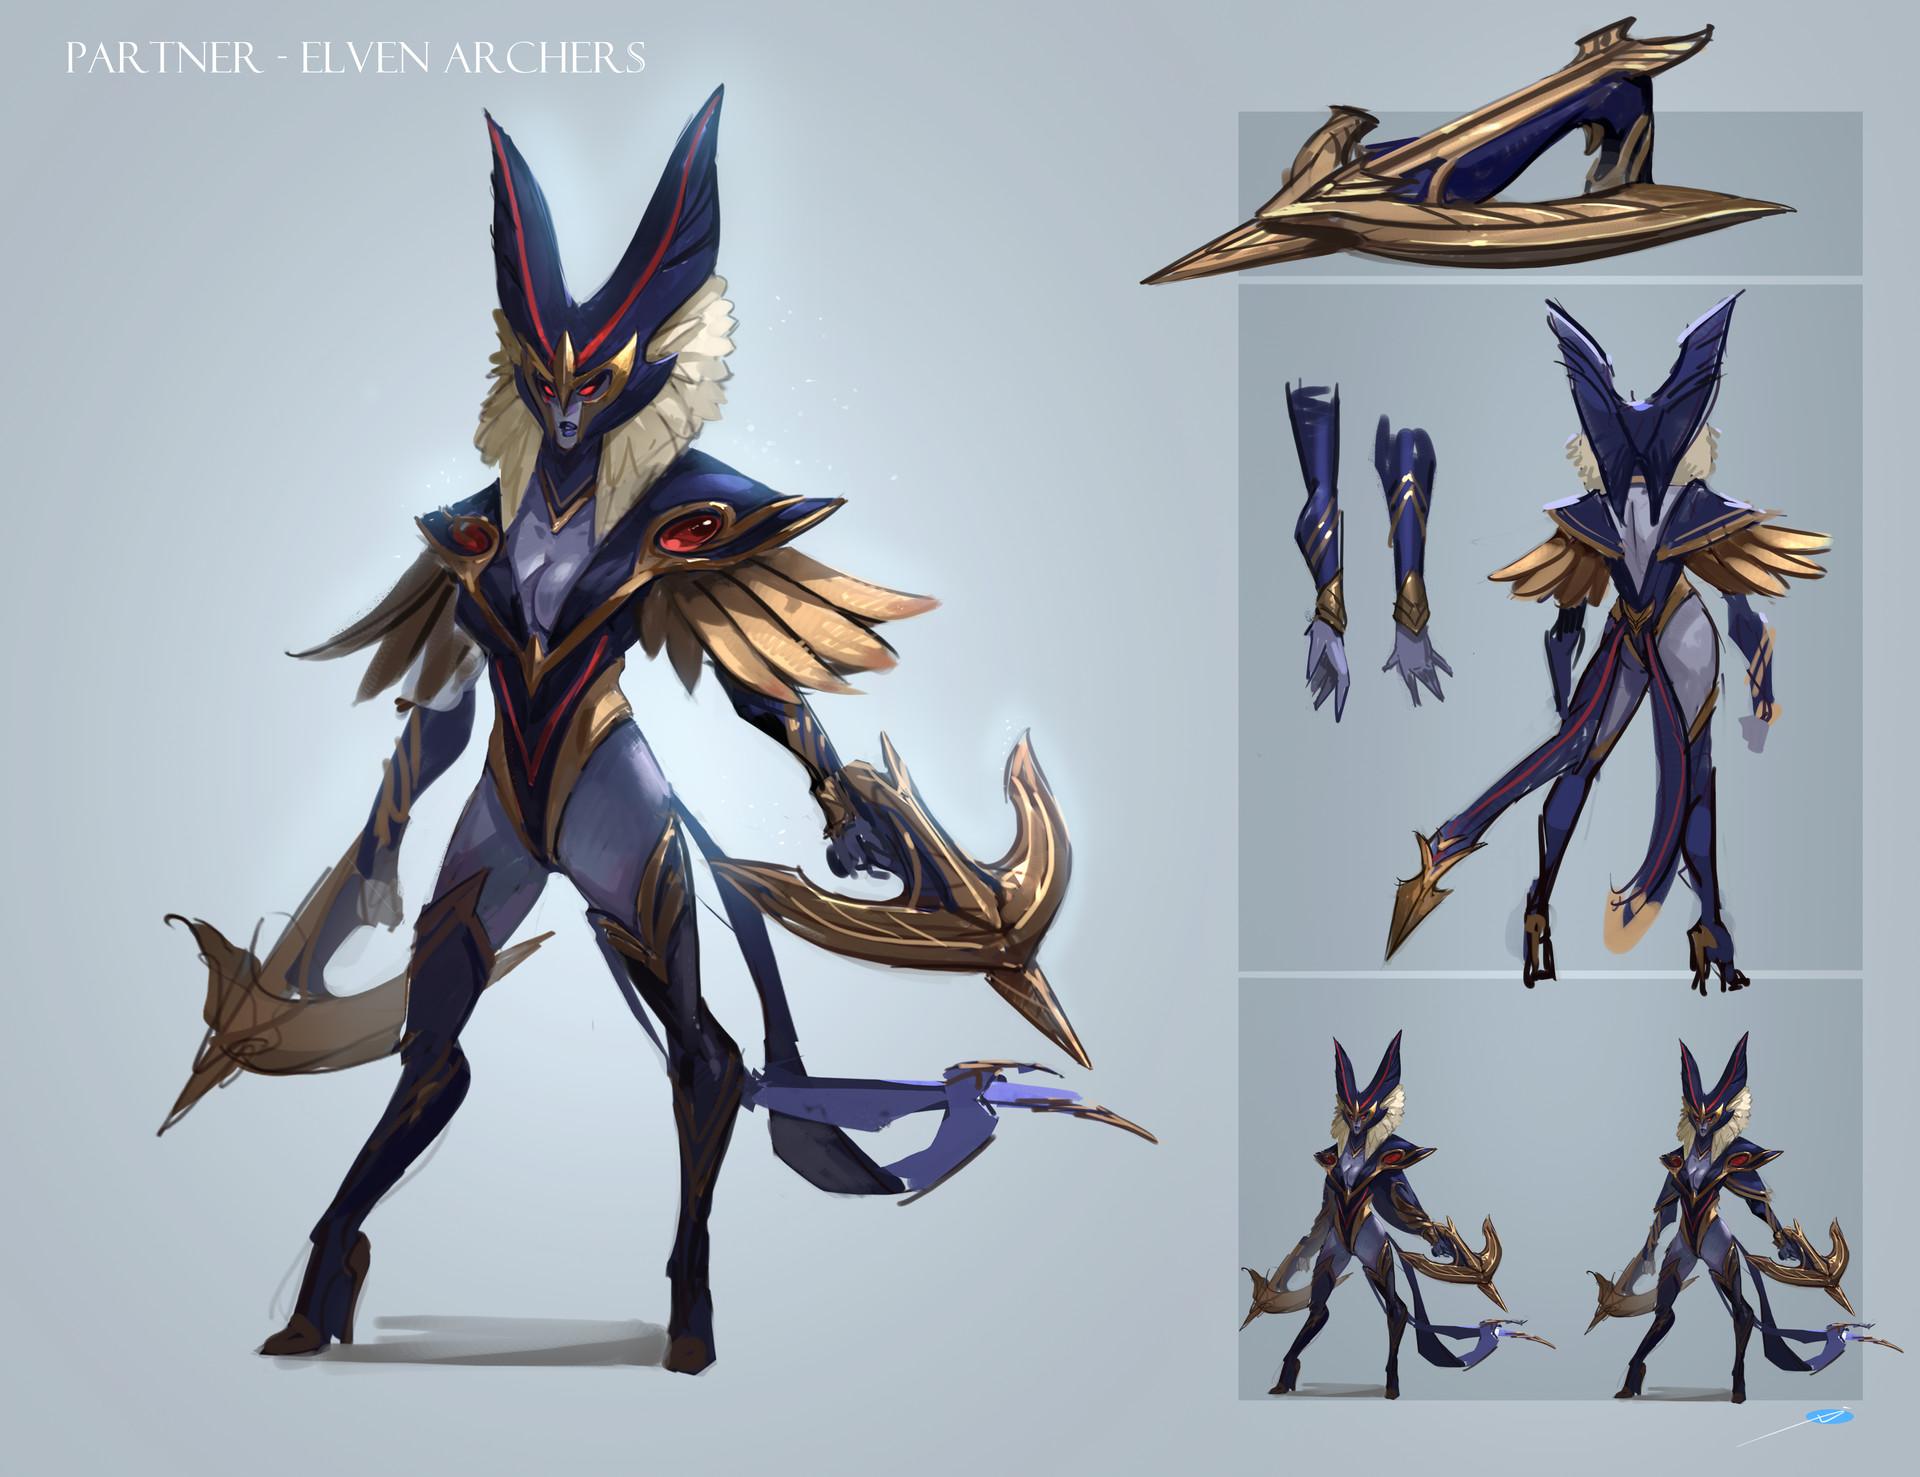 Gnomon Character Concept Design : Artstation design for last project hero xuexiang zhang